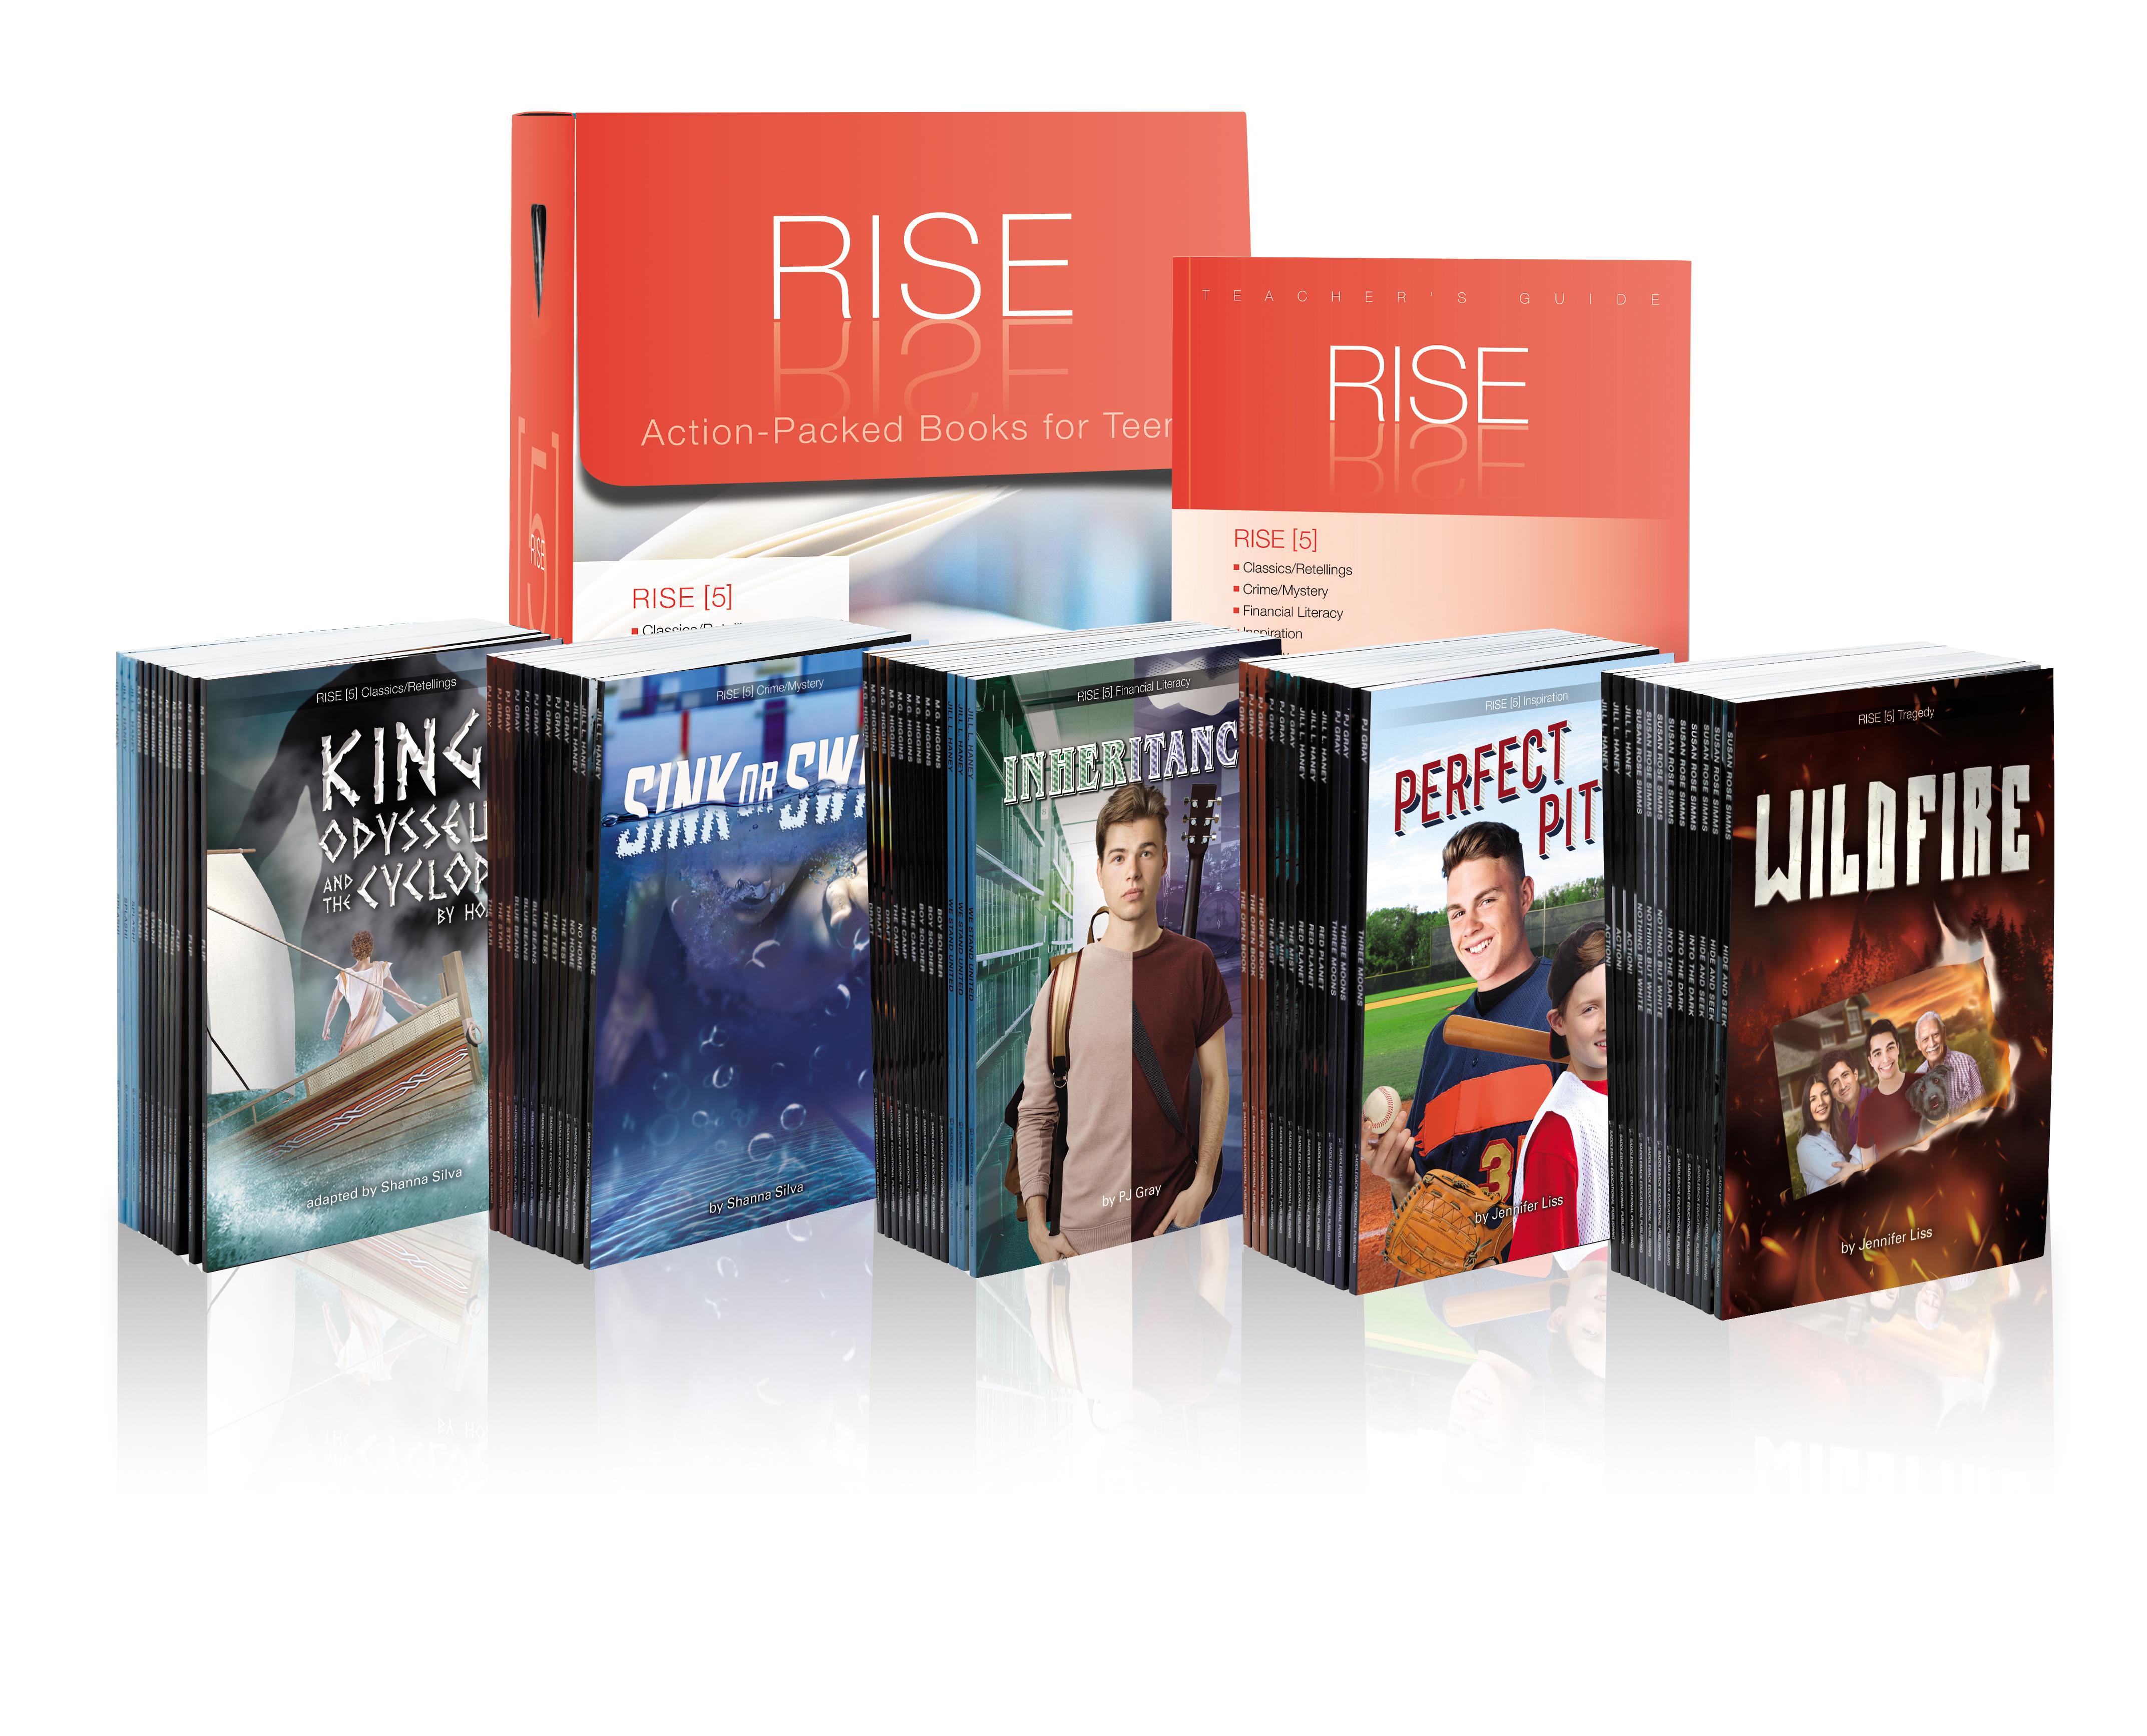 rise-5-box-set-rgb.jpg